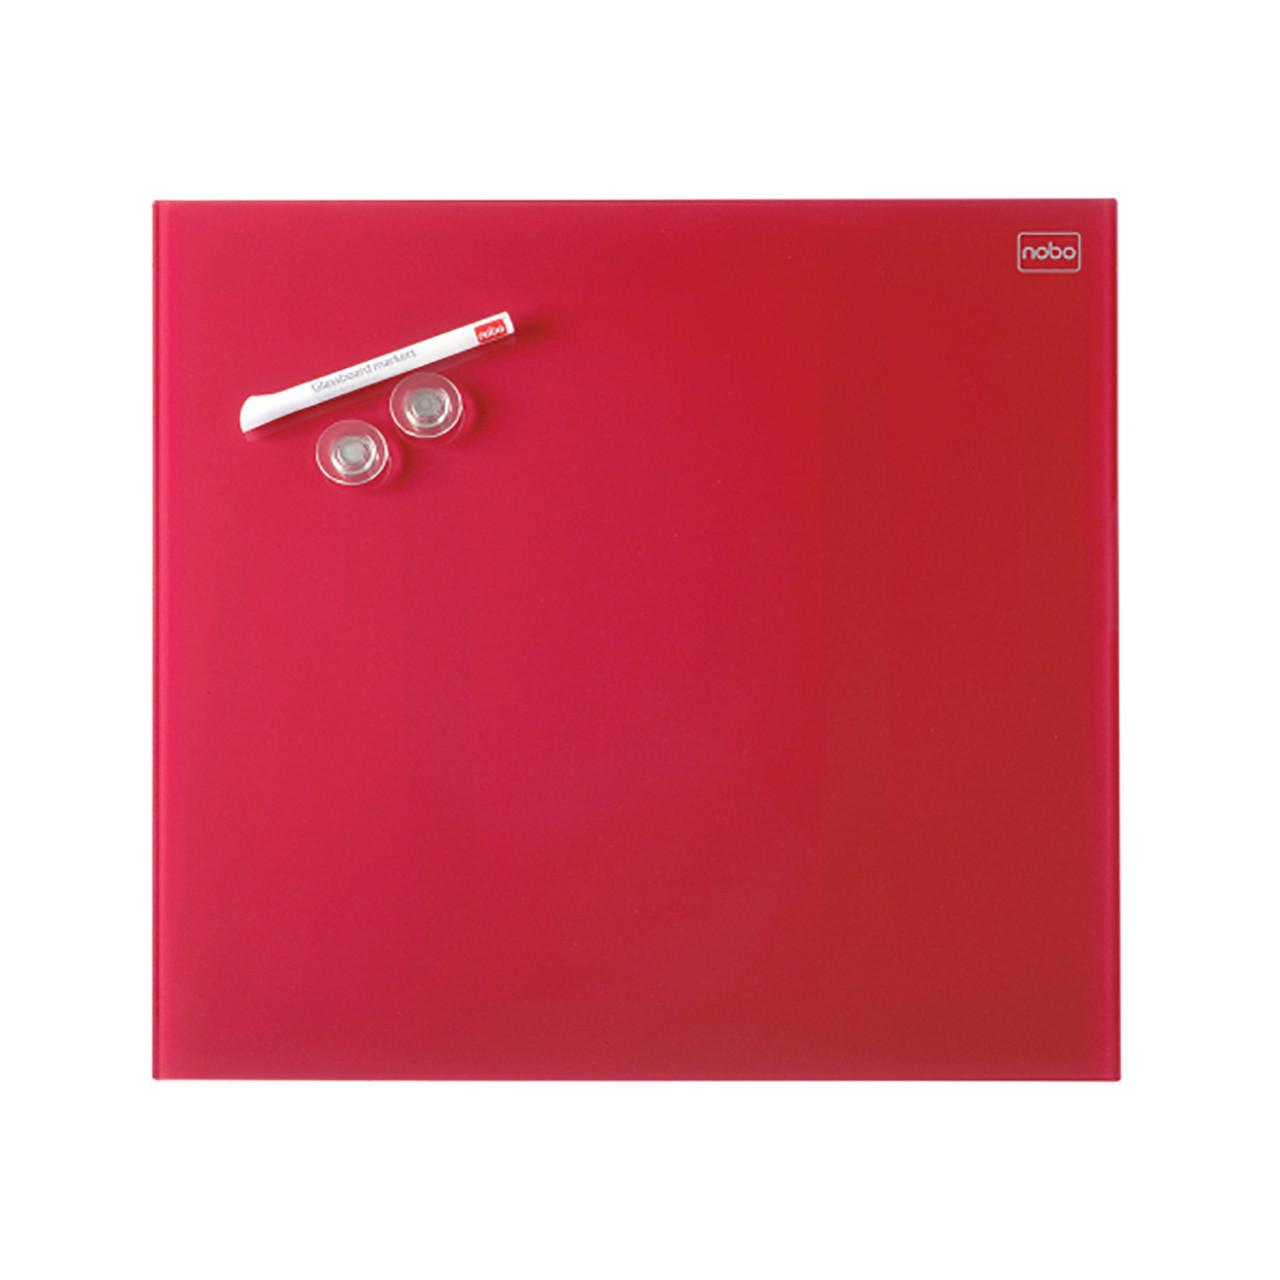 Доска стеклянная магнитно-маркерная Nobo Diamond Glass 30 х 30 см красная